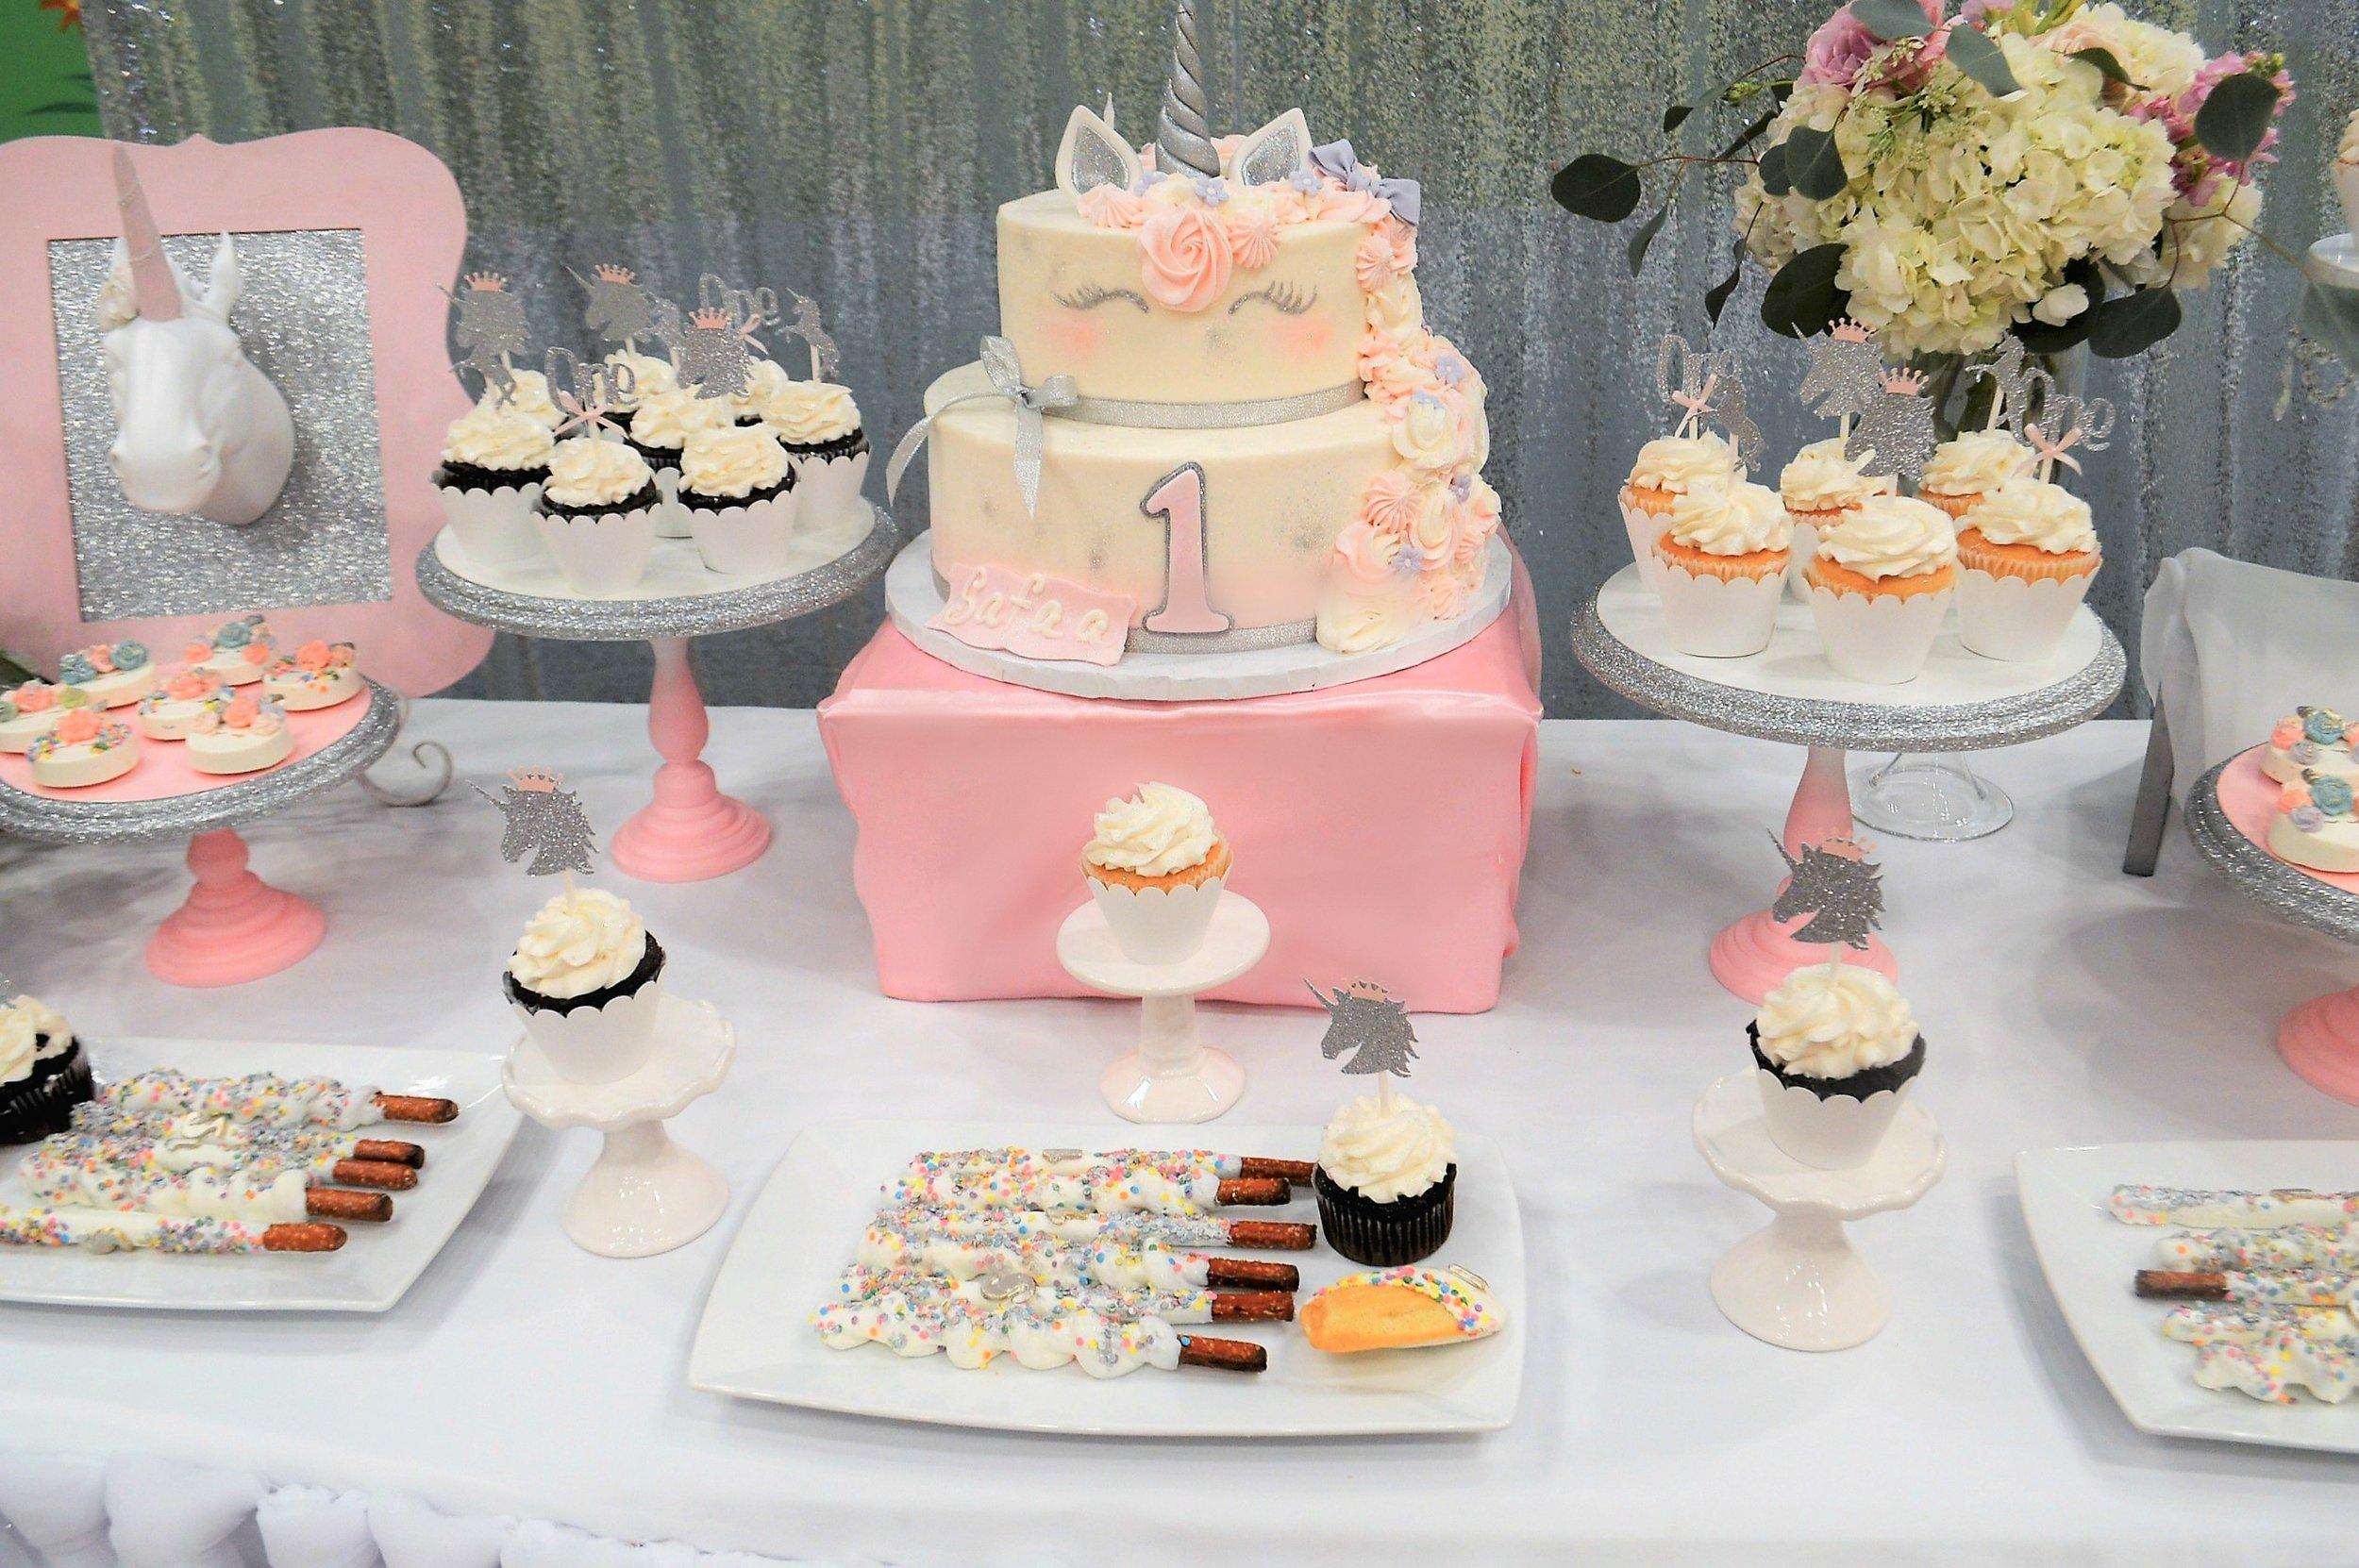 Unicorn First Birthday-Unicorn Cake-Unicorn Party Ideas-unicorn-unicorn birthday party-unicorn dessert table-unicorn birthday party decor-unicorn cake-www.Sugarpartiesla.com.jpg